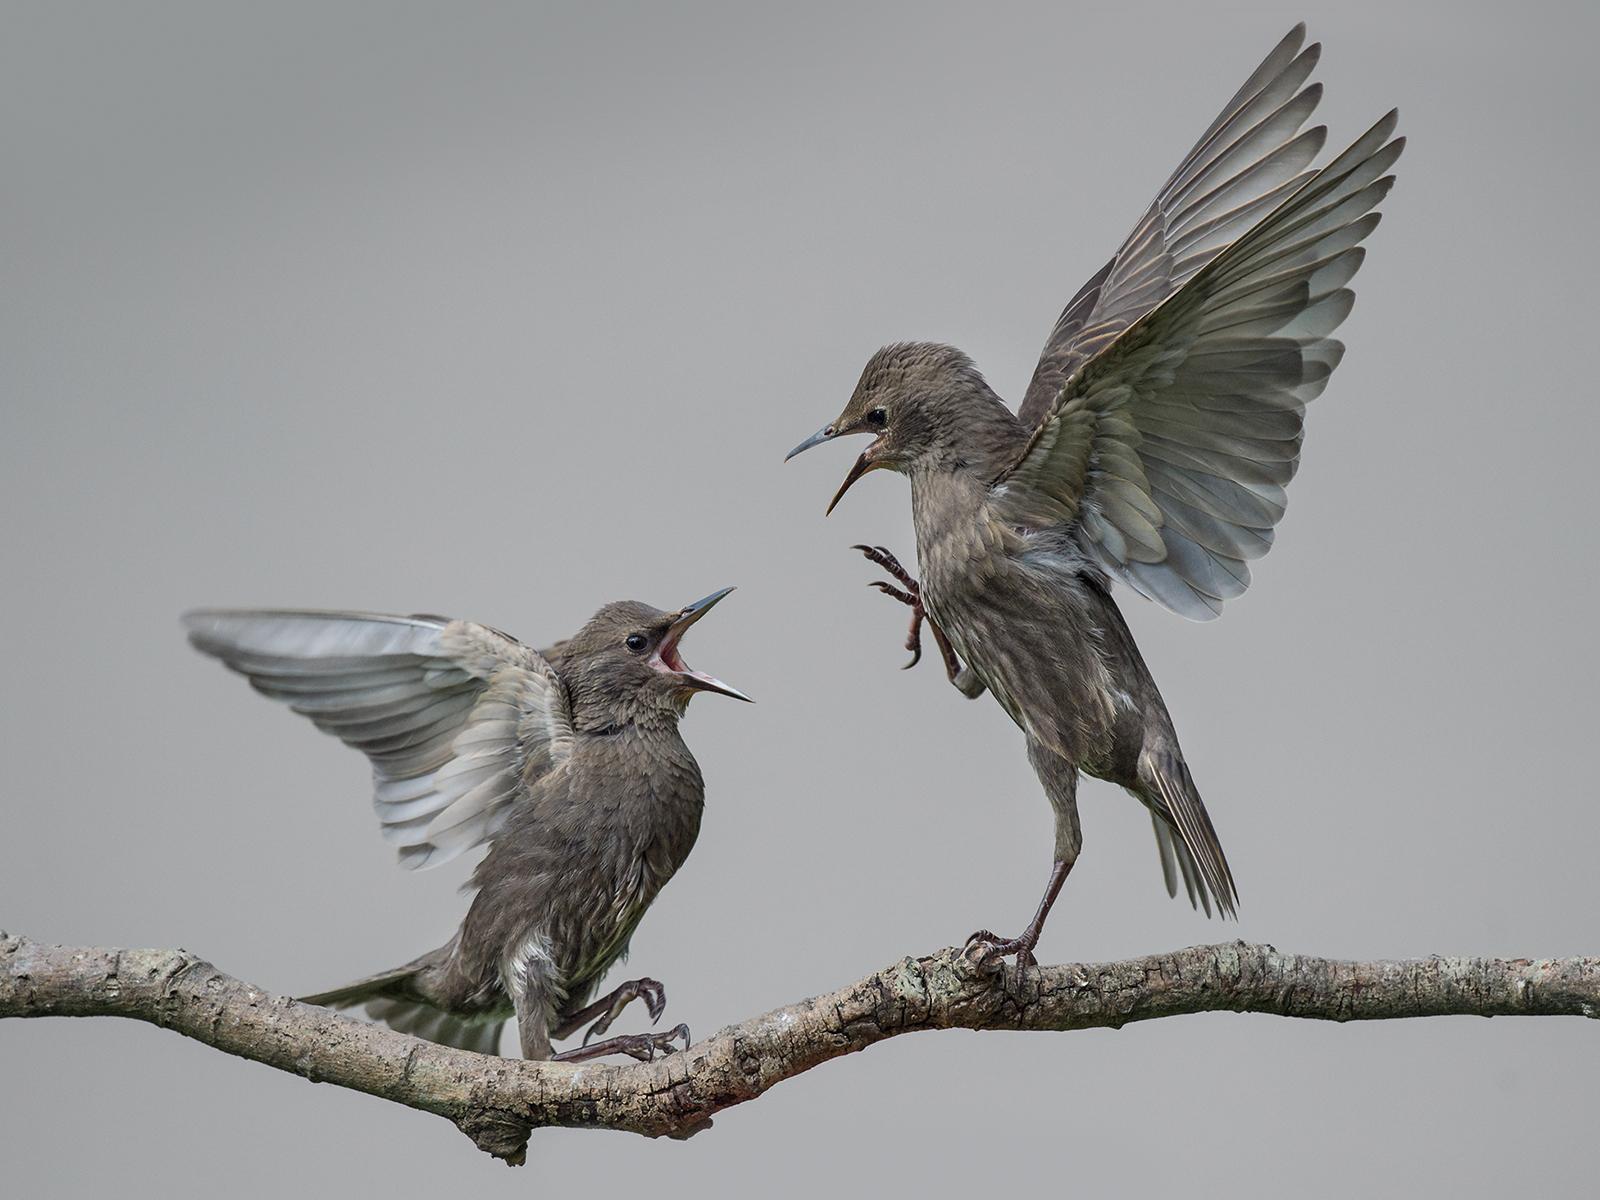 W0447188_Philip-Barber_Staring-fight